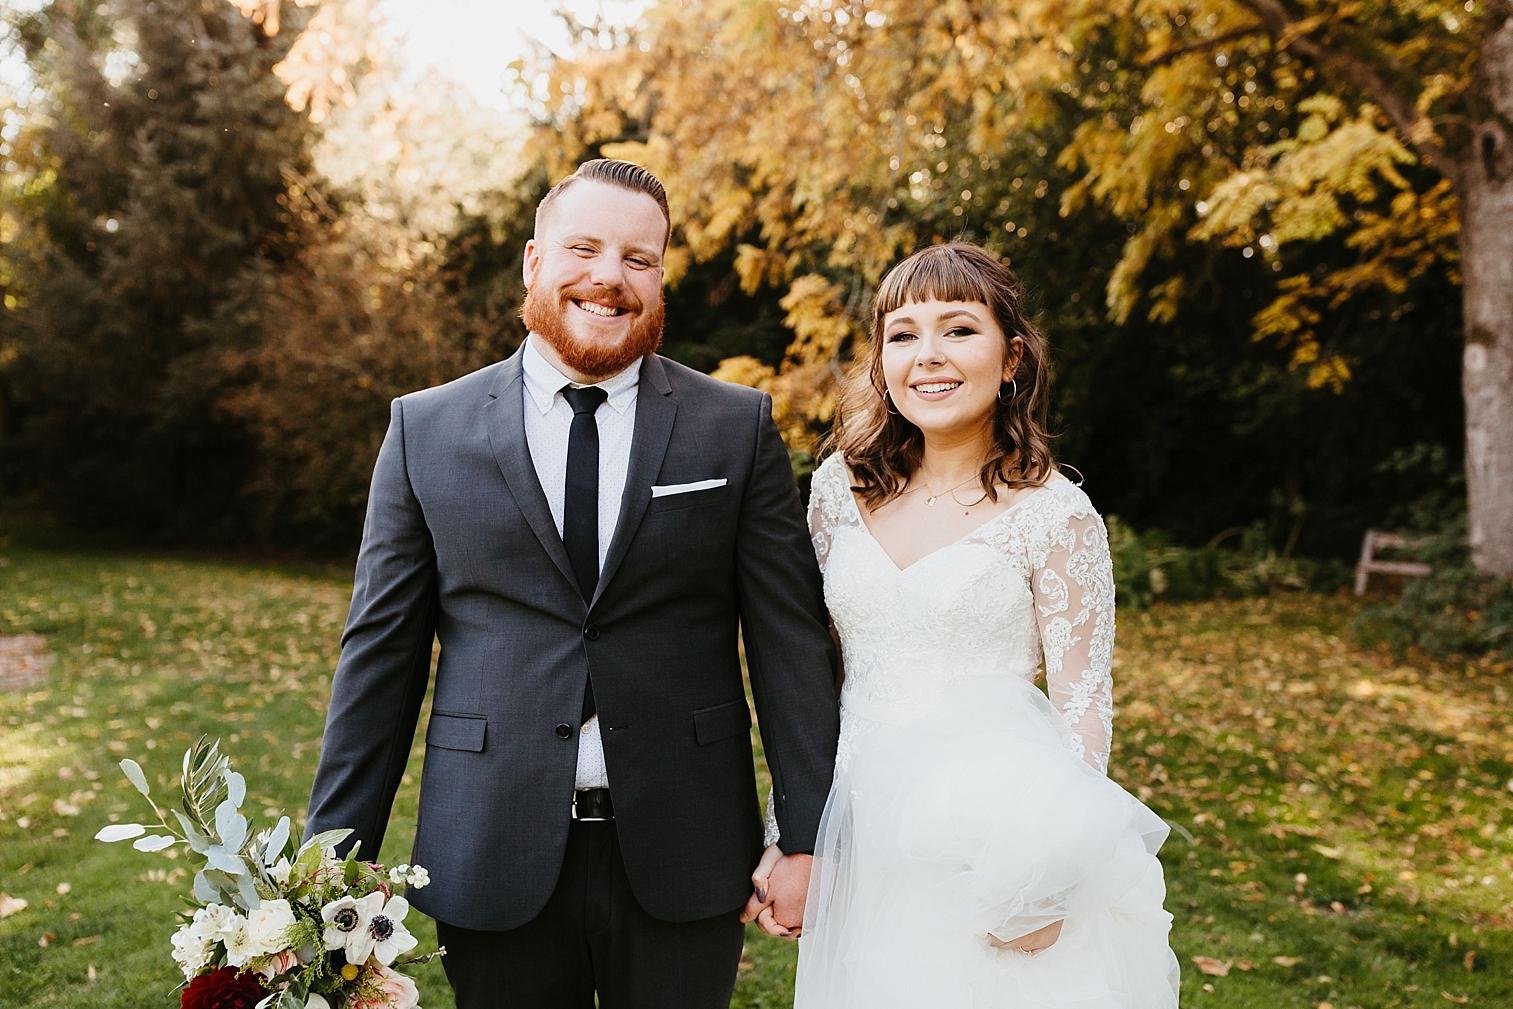 Barnstar-Wedding-64.jpg